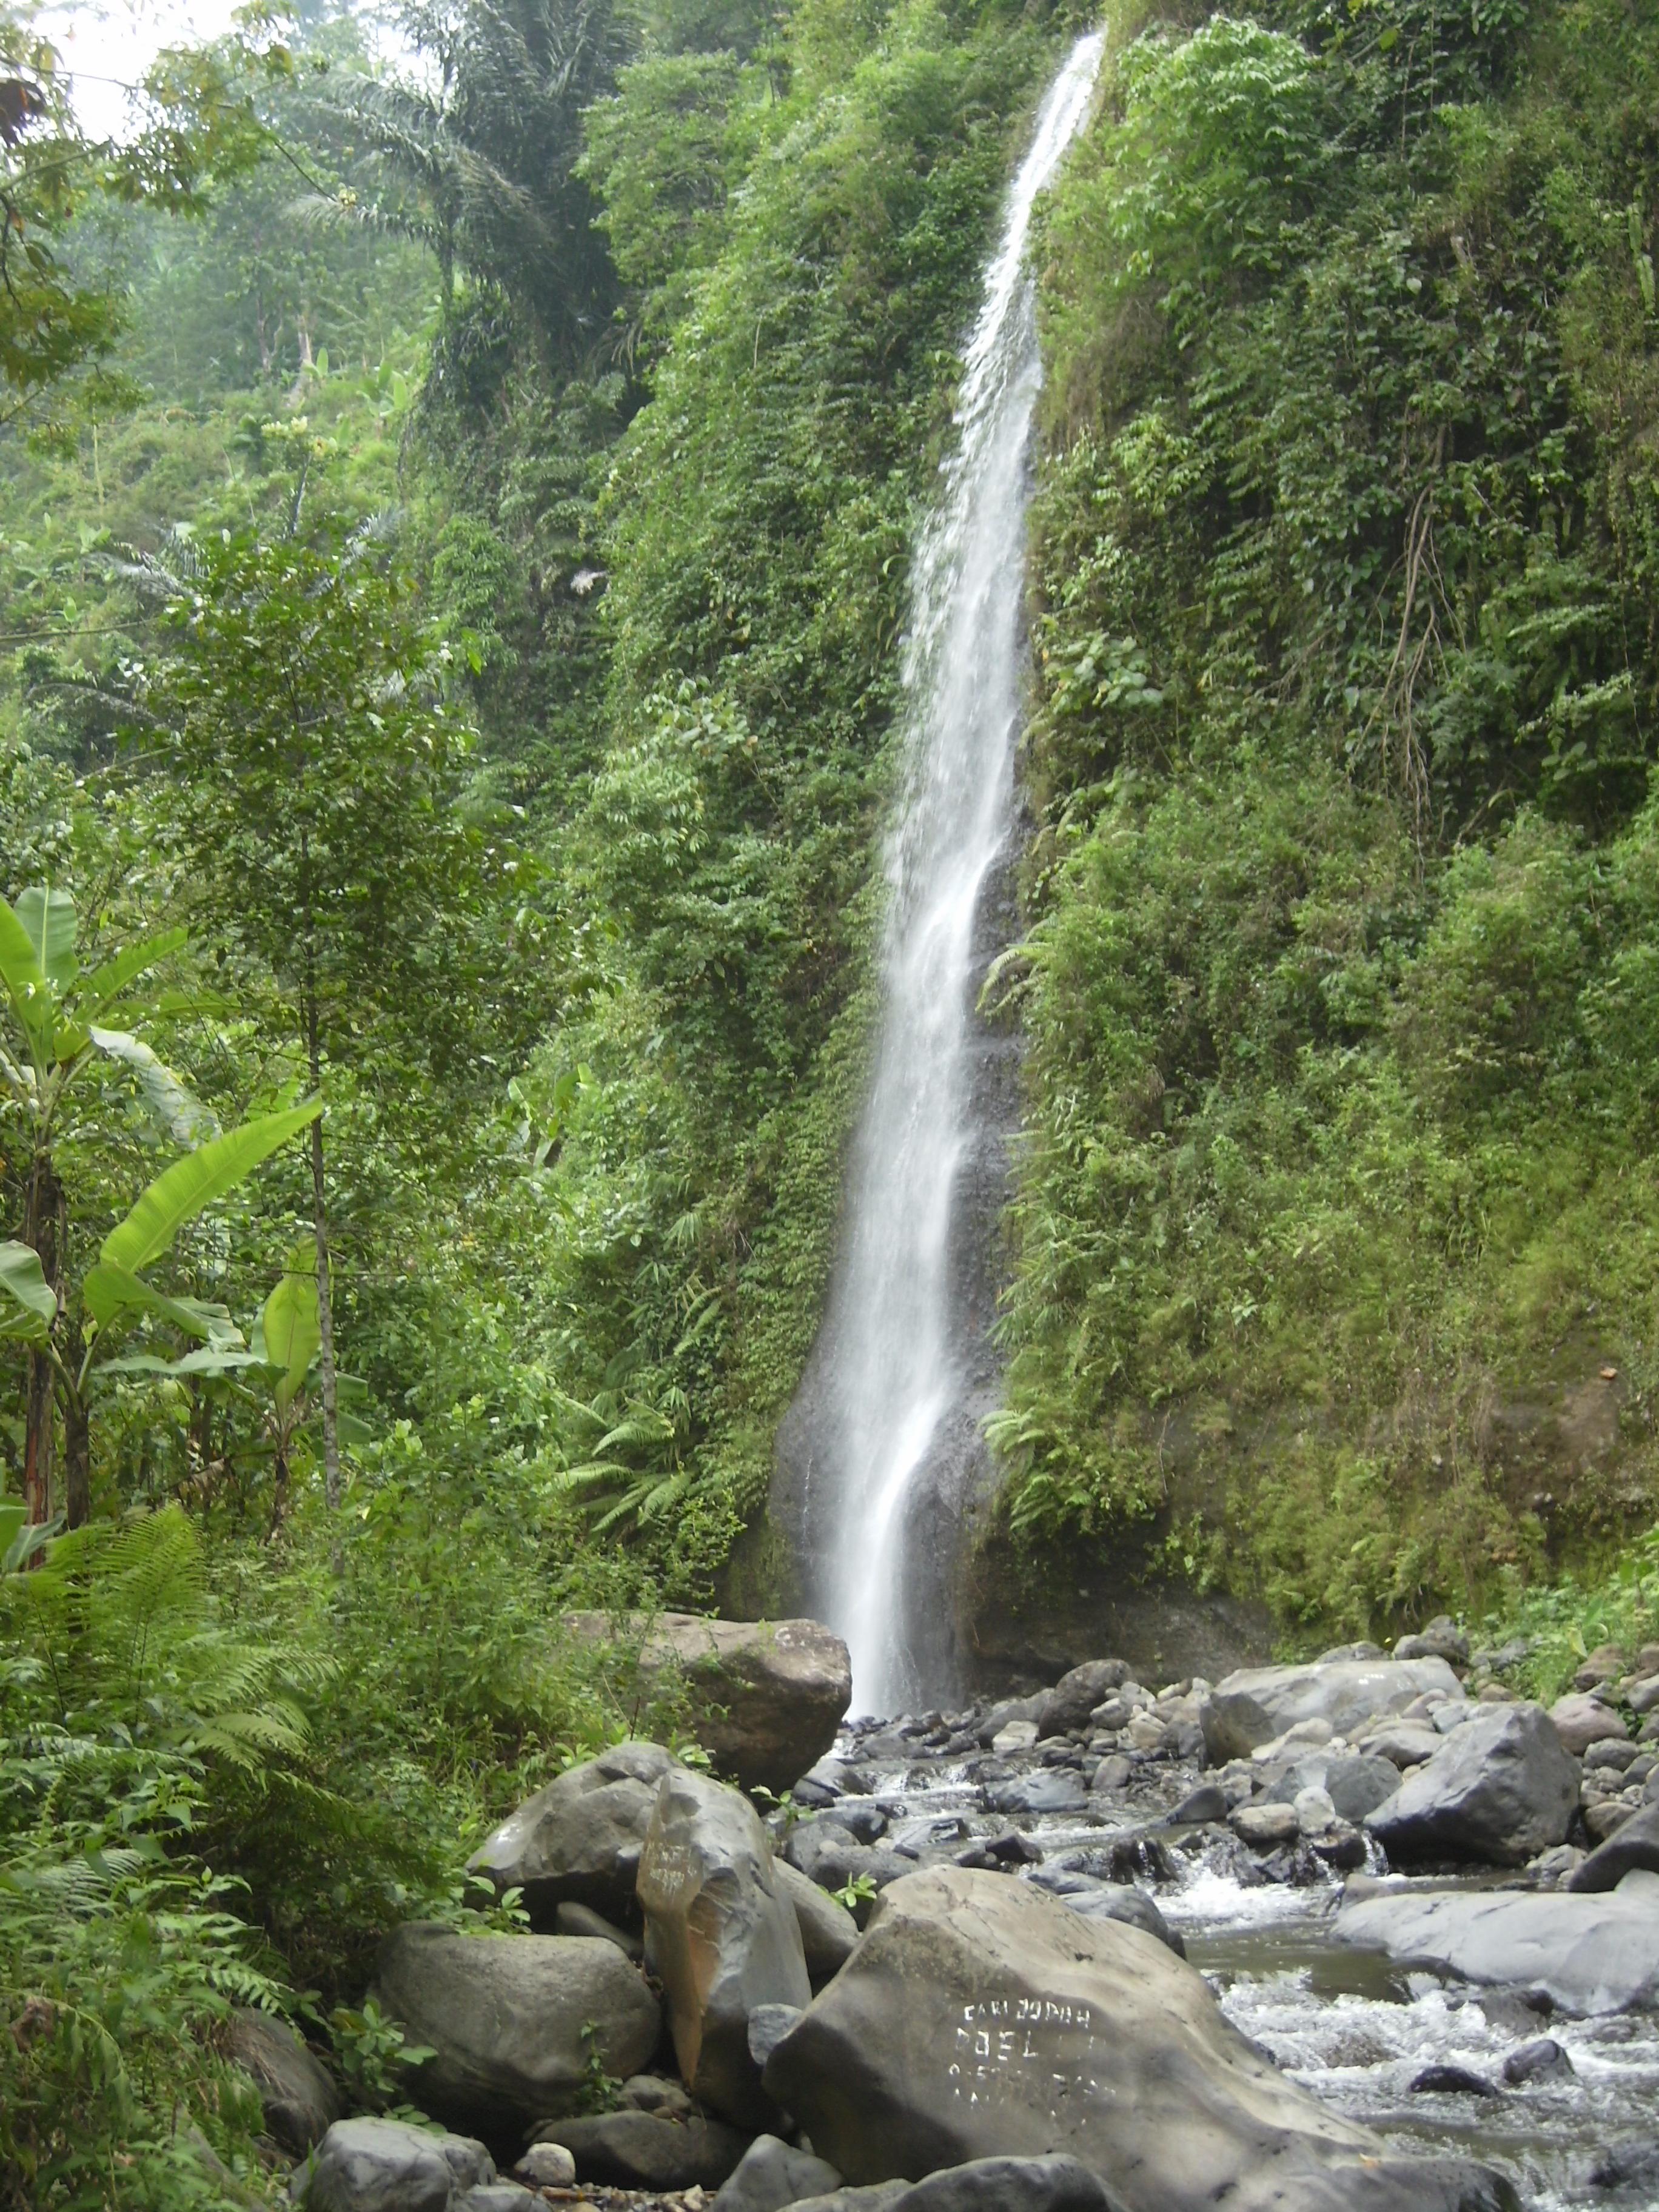 Inilah 26 Tempat Wisata Terbaik Pati Jawa Tengah Masterplesir Blogspot